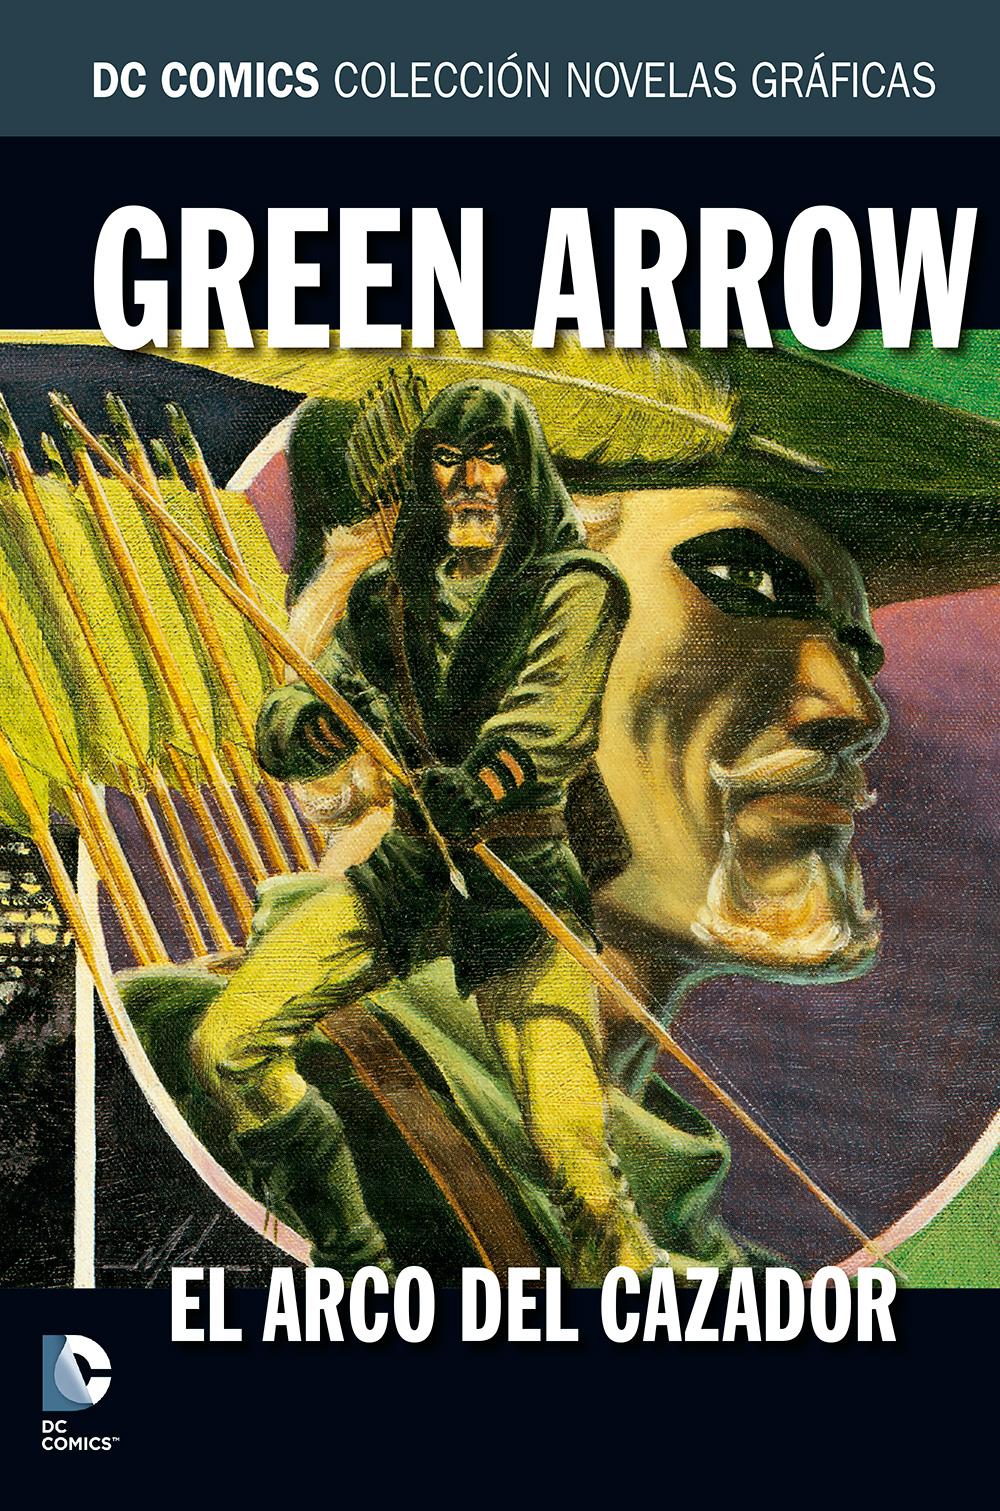 106 - [DC - Salvat] La Colección de Novelas Gráficas de DC Comics  SF118_033_01_001